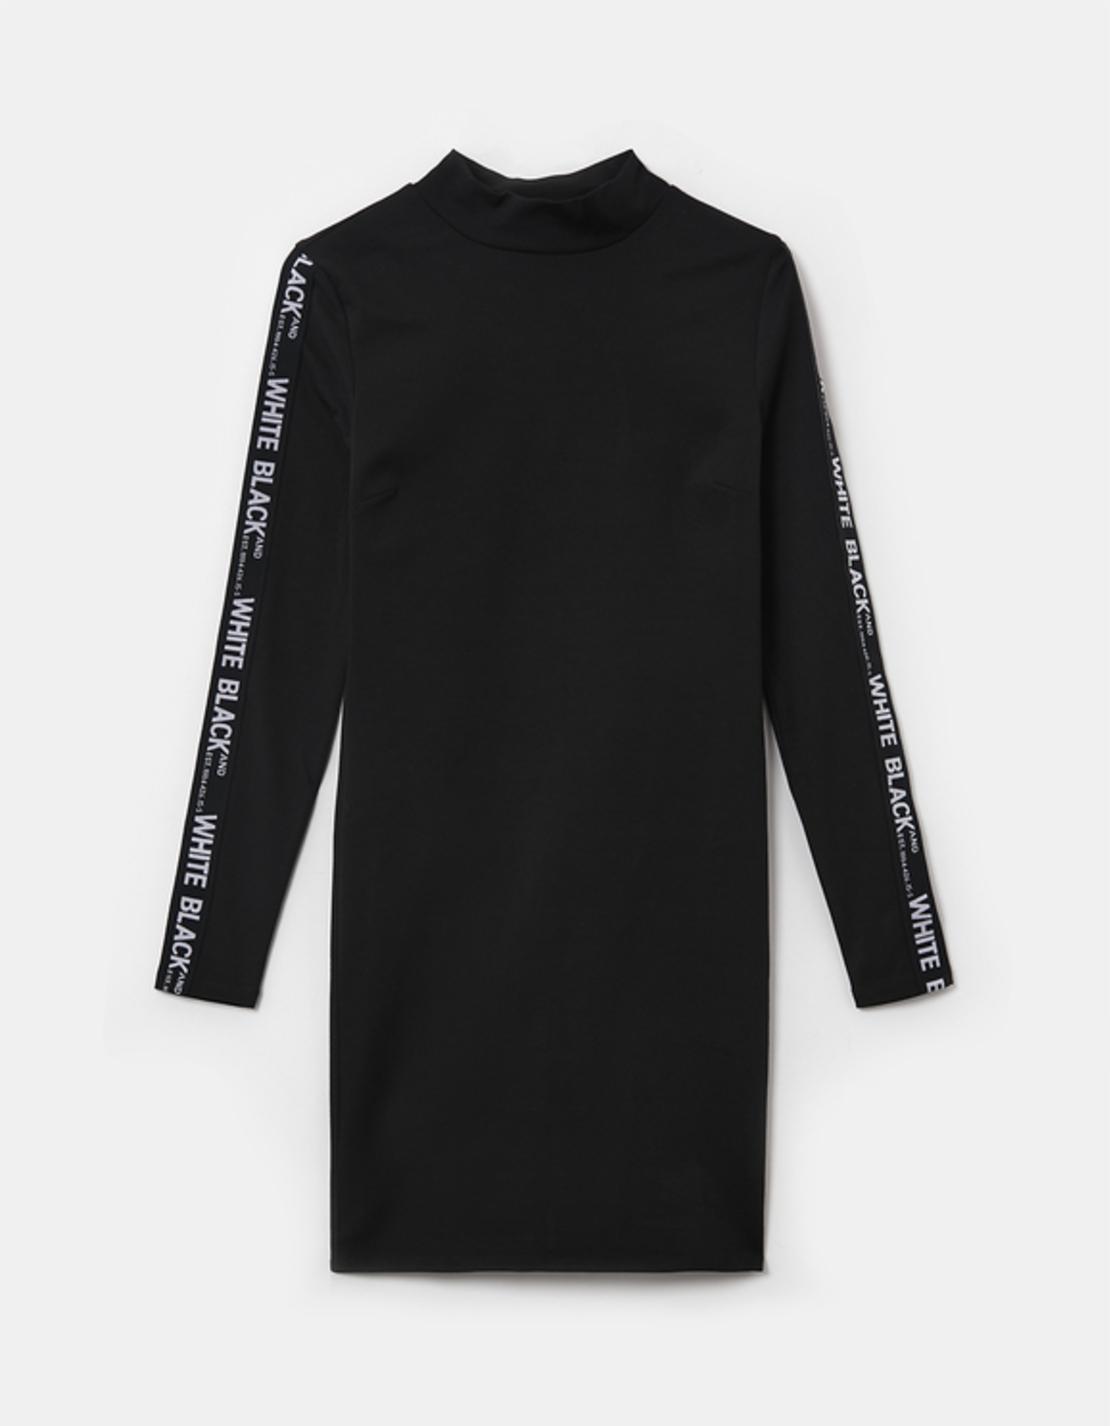 SDRCOFILUS-HH BLK009  שמלה חצי גולף צמודה סרט מודפס